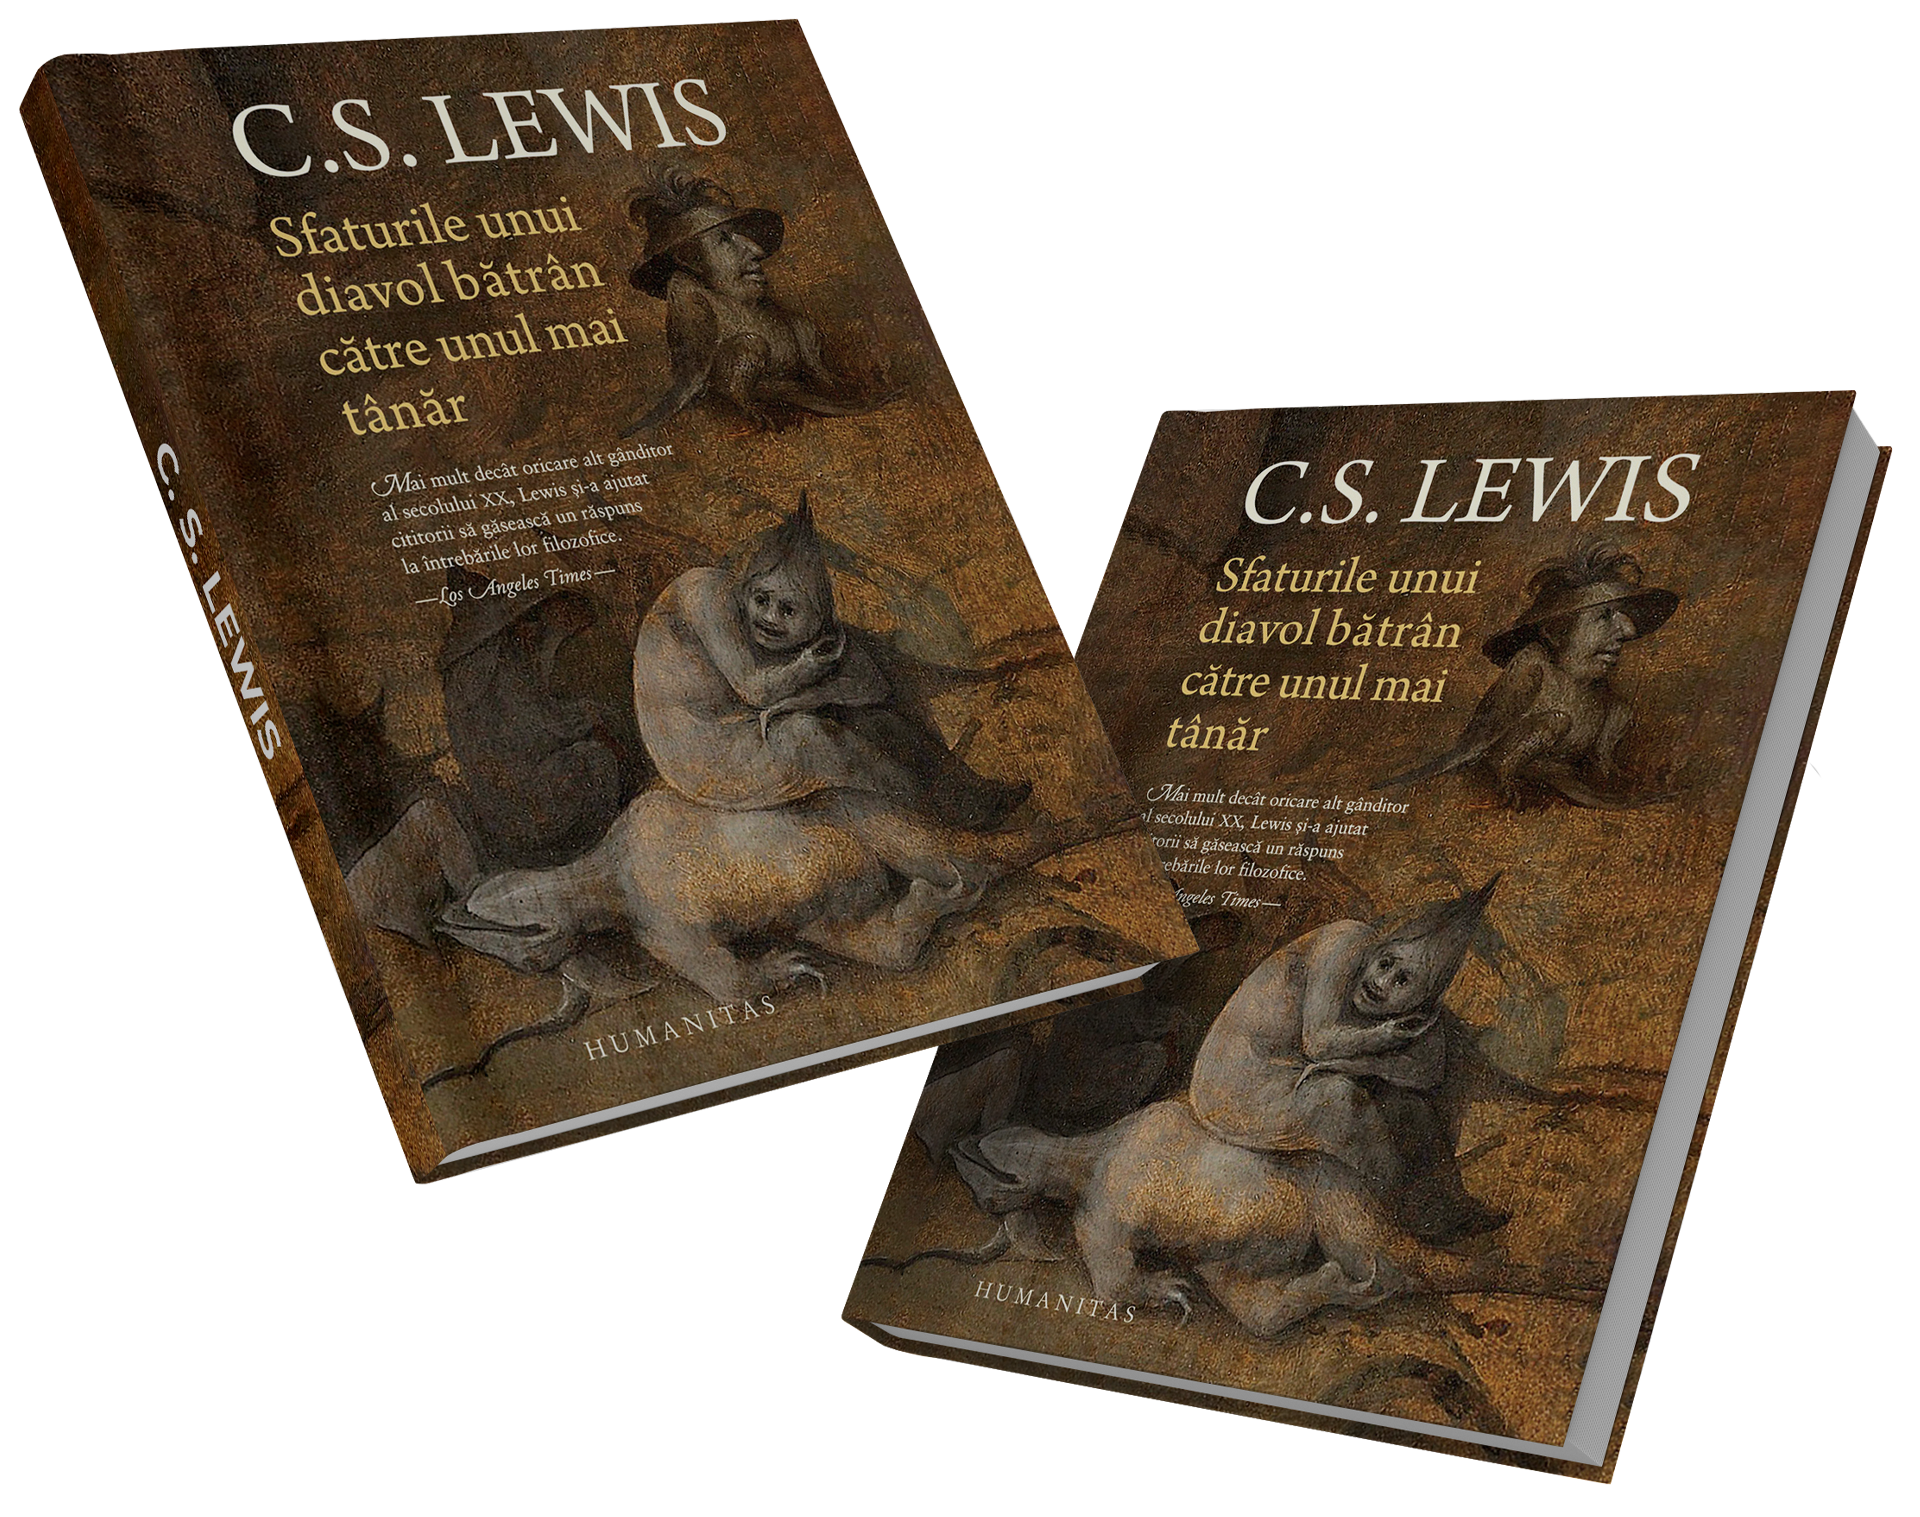 recenzie CS Lewis carte sfaturile unui diavol batran